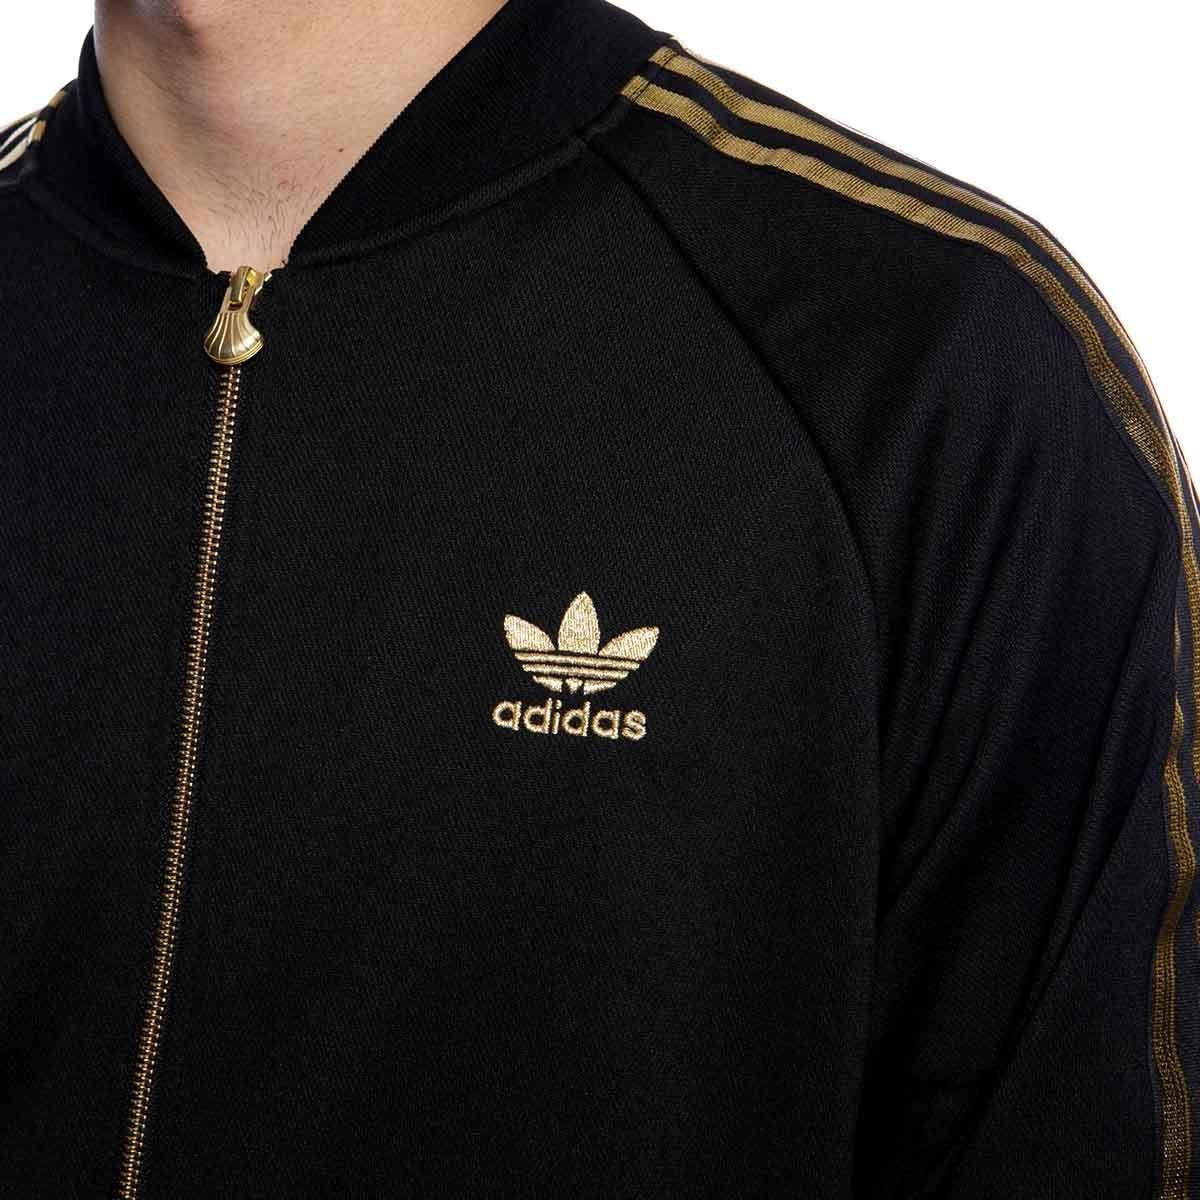 Bluza Adidas Originals SST 24 TT blackgold metallic